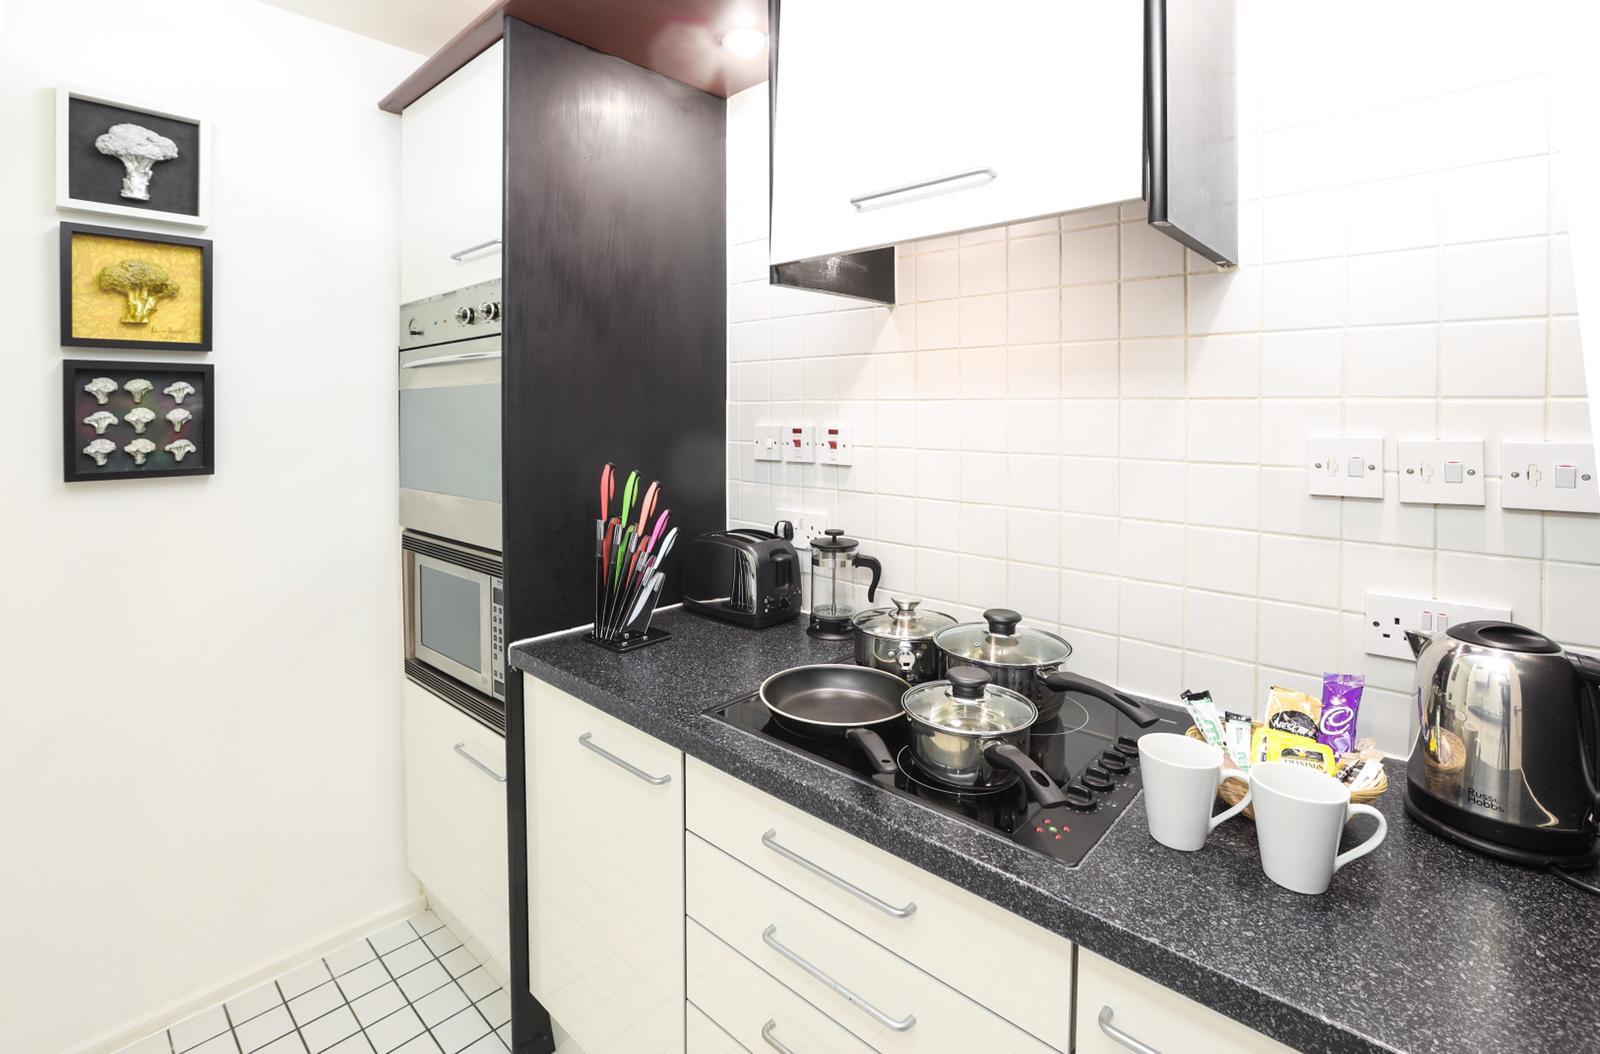 Kitchen at 116 Point West Apartments, South Kensington, London